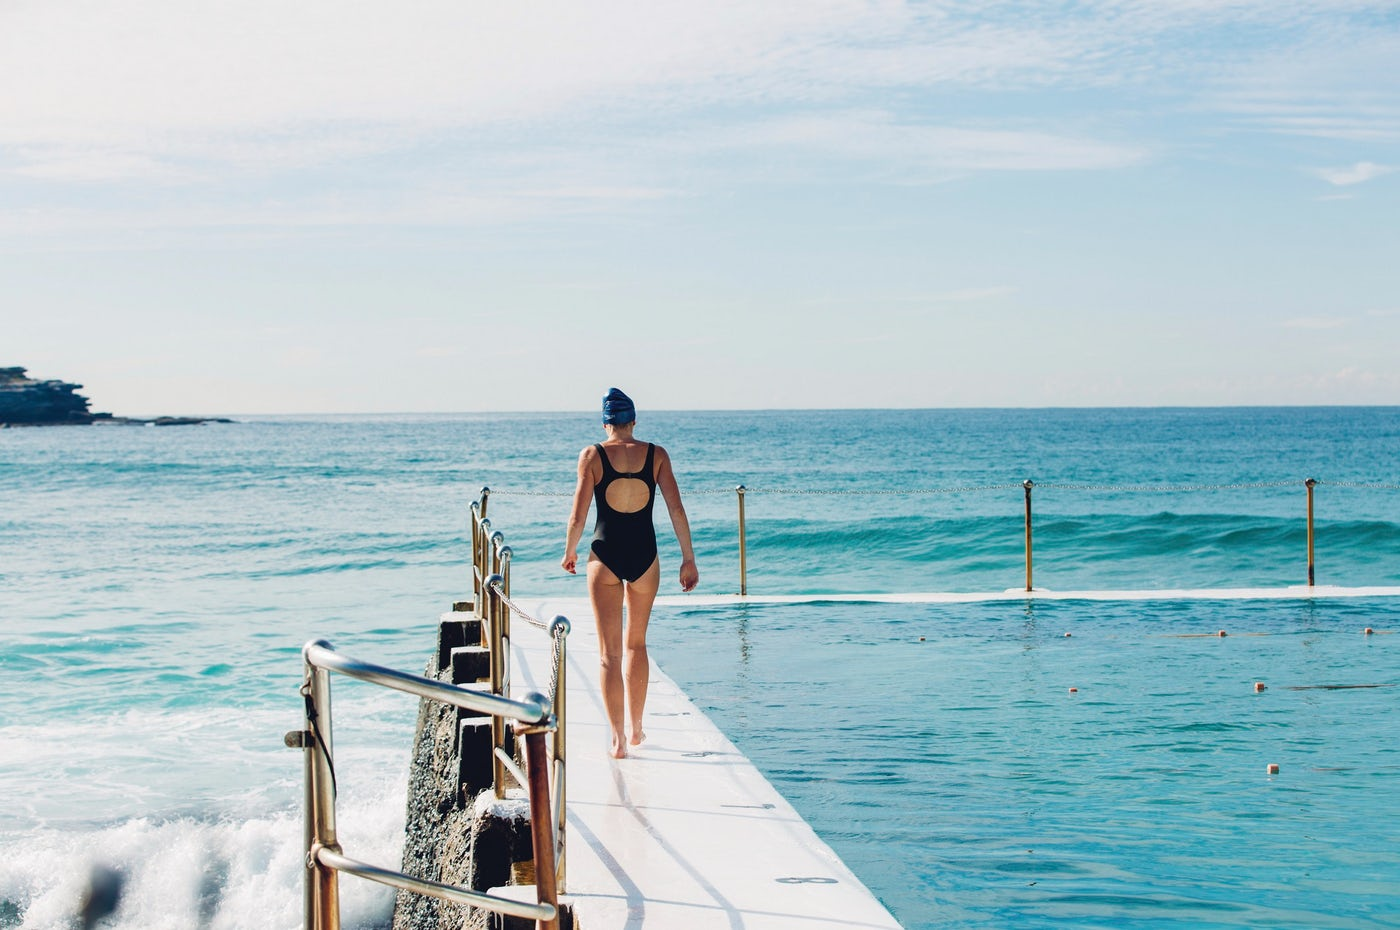 Woman out for a morning swim at Bondi Icebergs, Bondi Beach.